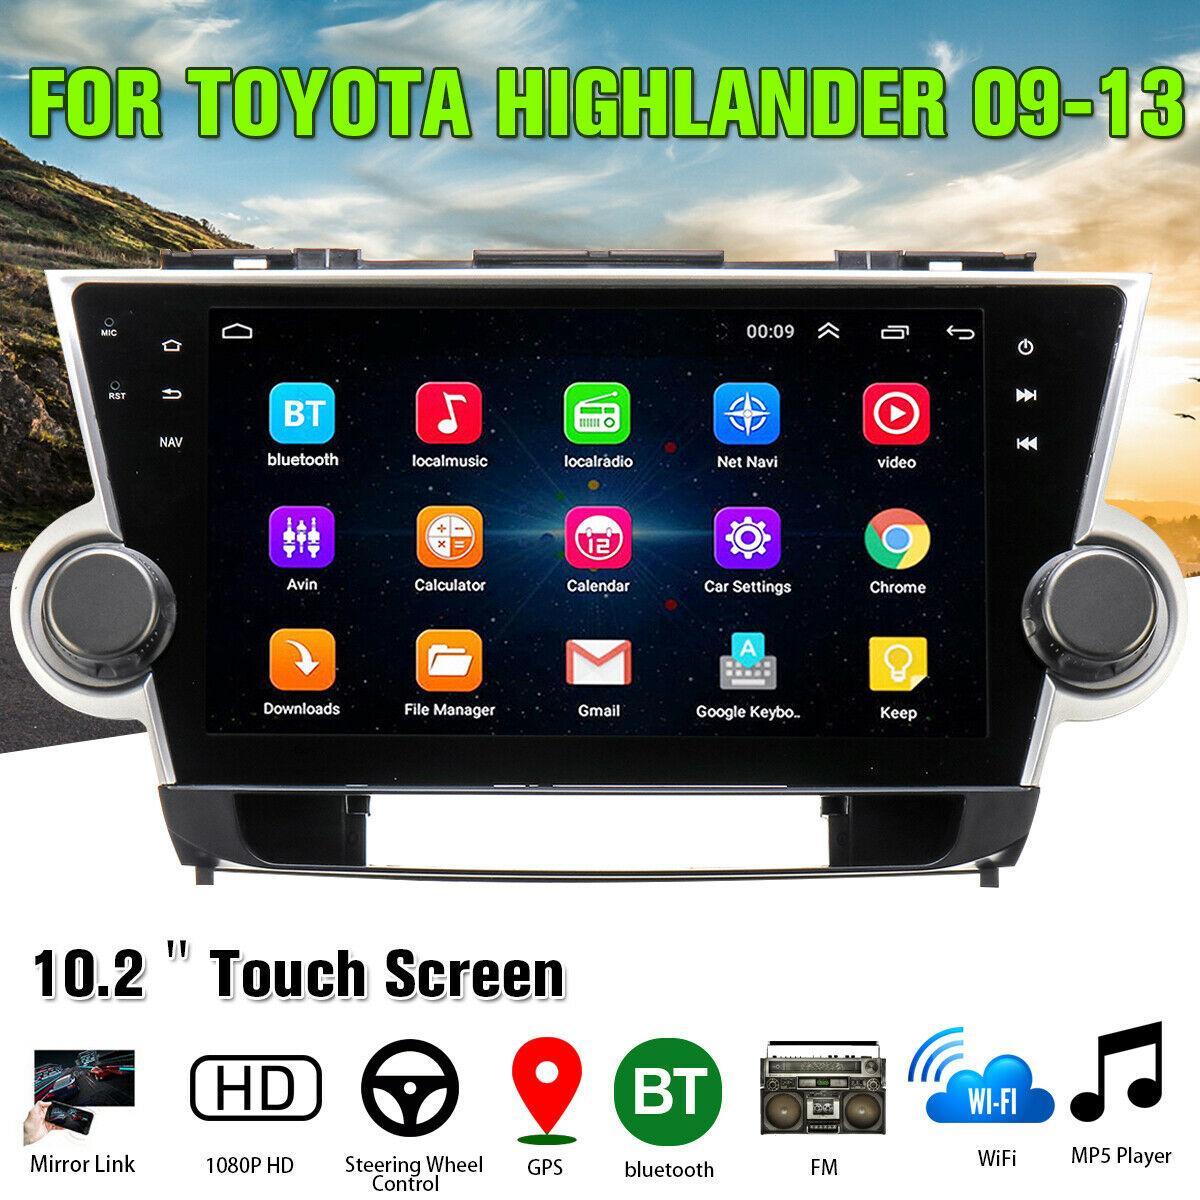 10.2''  Android 10.1 System Car Stereo Radio GPS Navigation MP5 for Toyota Highlander 2009-2013 Radio Multimedia Player недорого